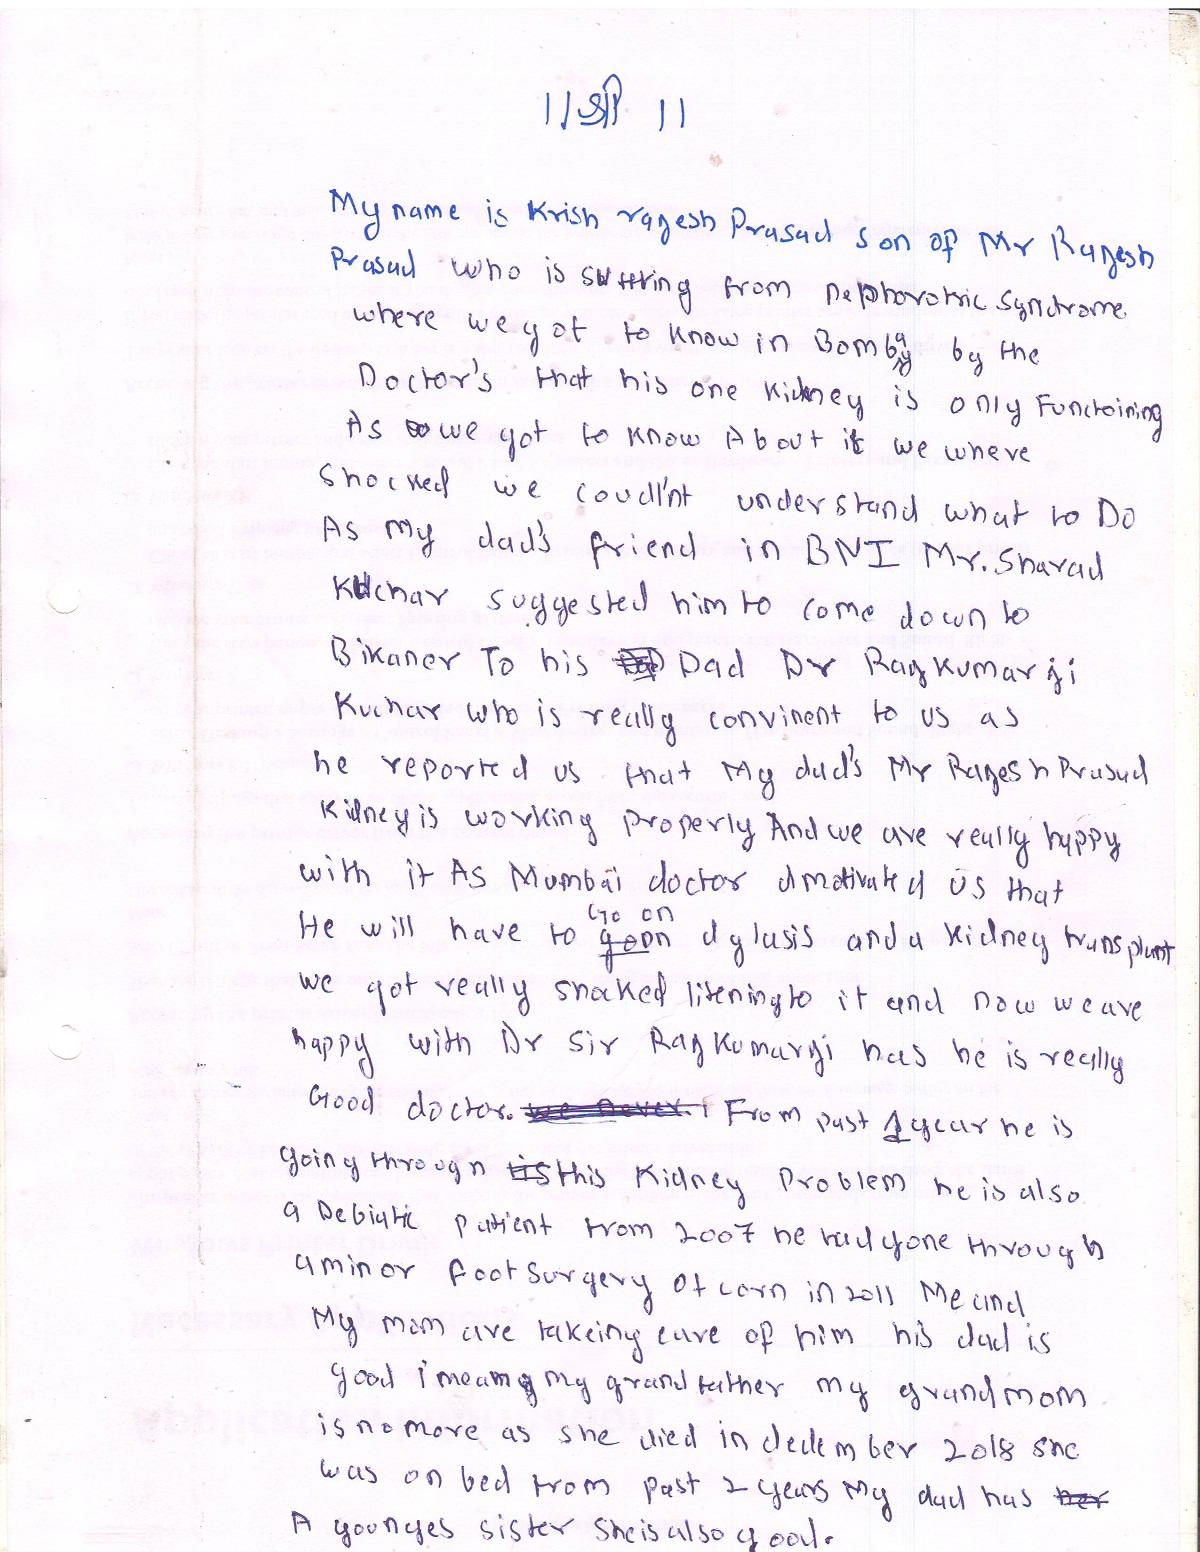 Rajesh-Parsad-Nephropathy-0014